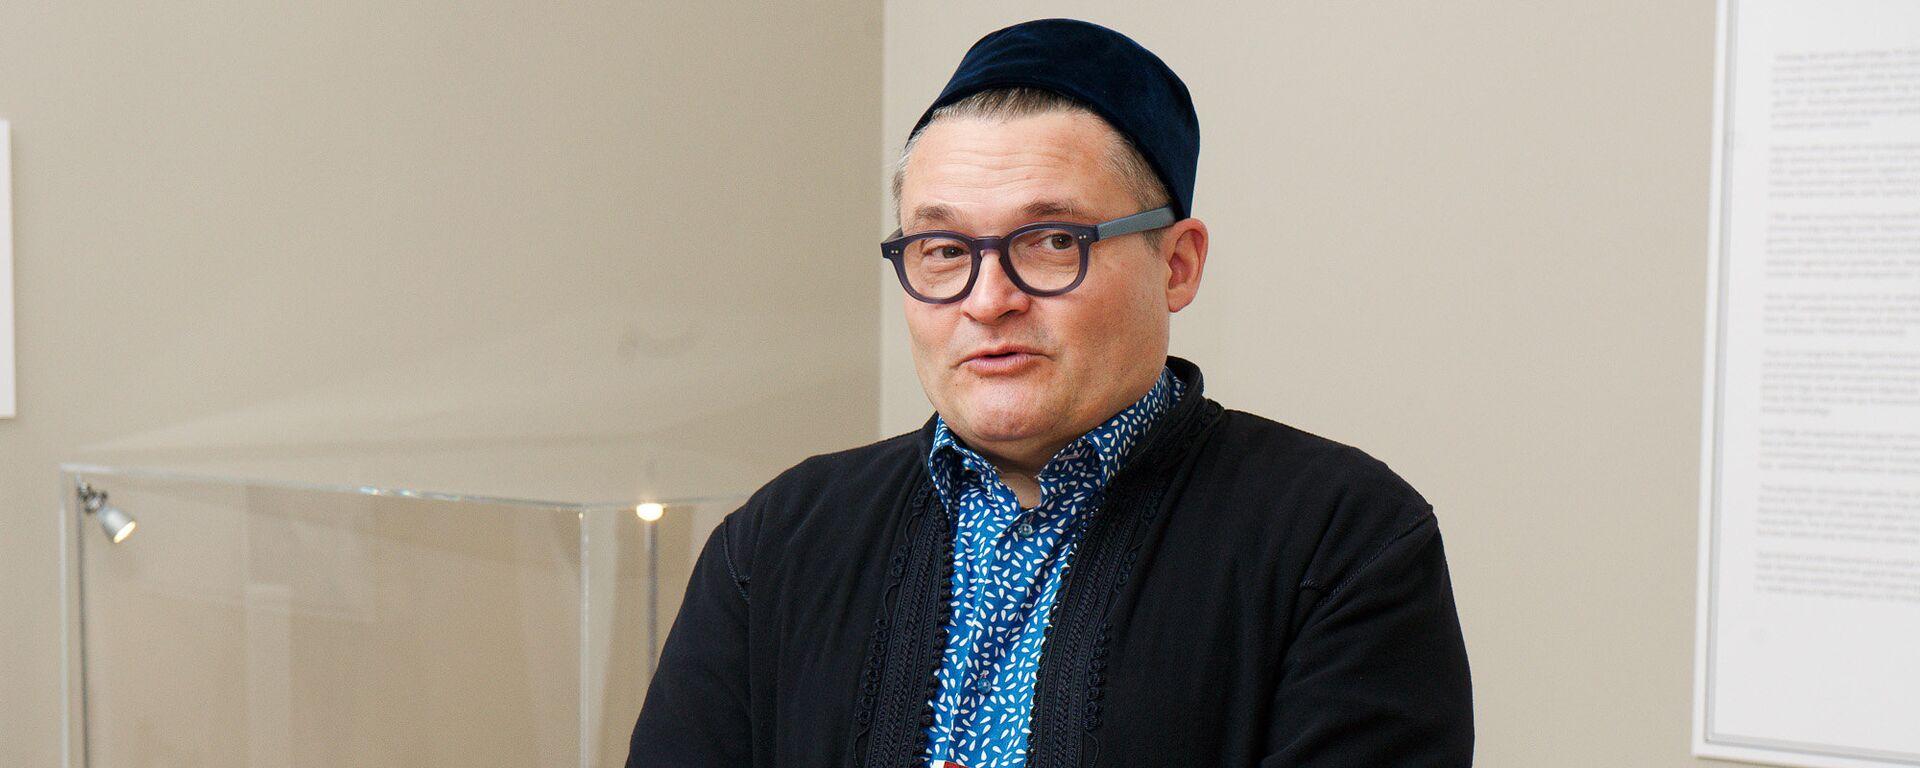 Историк моды и коллекционер Александр Васильев - Sputnik Латвия, 1920, 04.03.2017